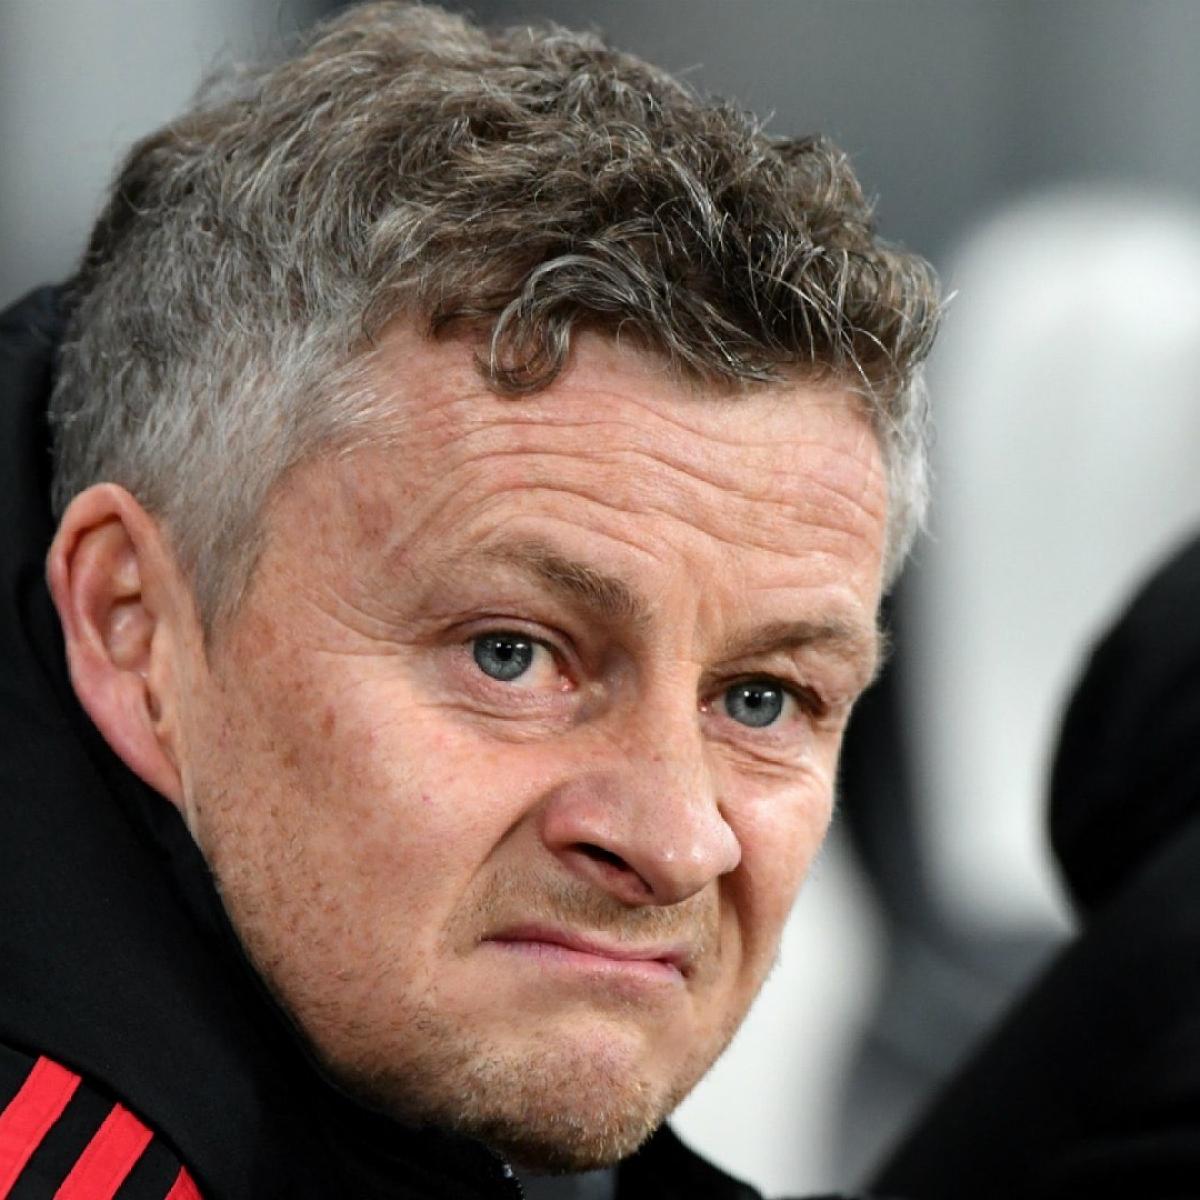 Champions League: RB Leipzig through, Man Utd back in Europa League